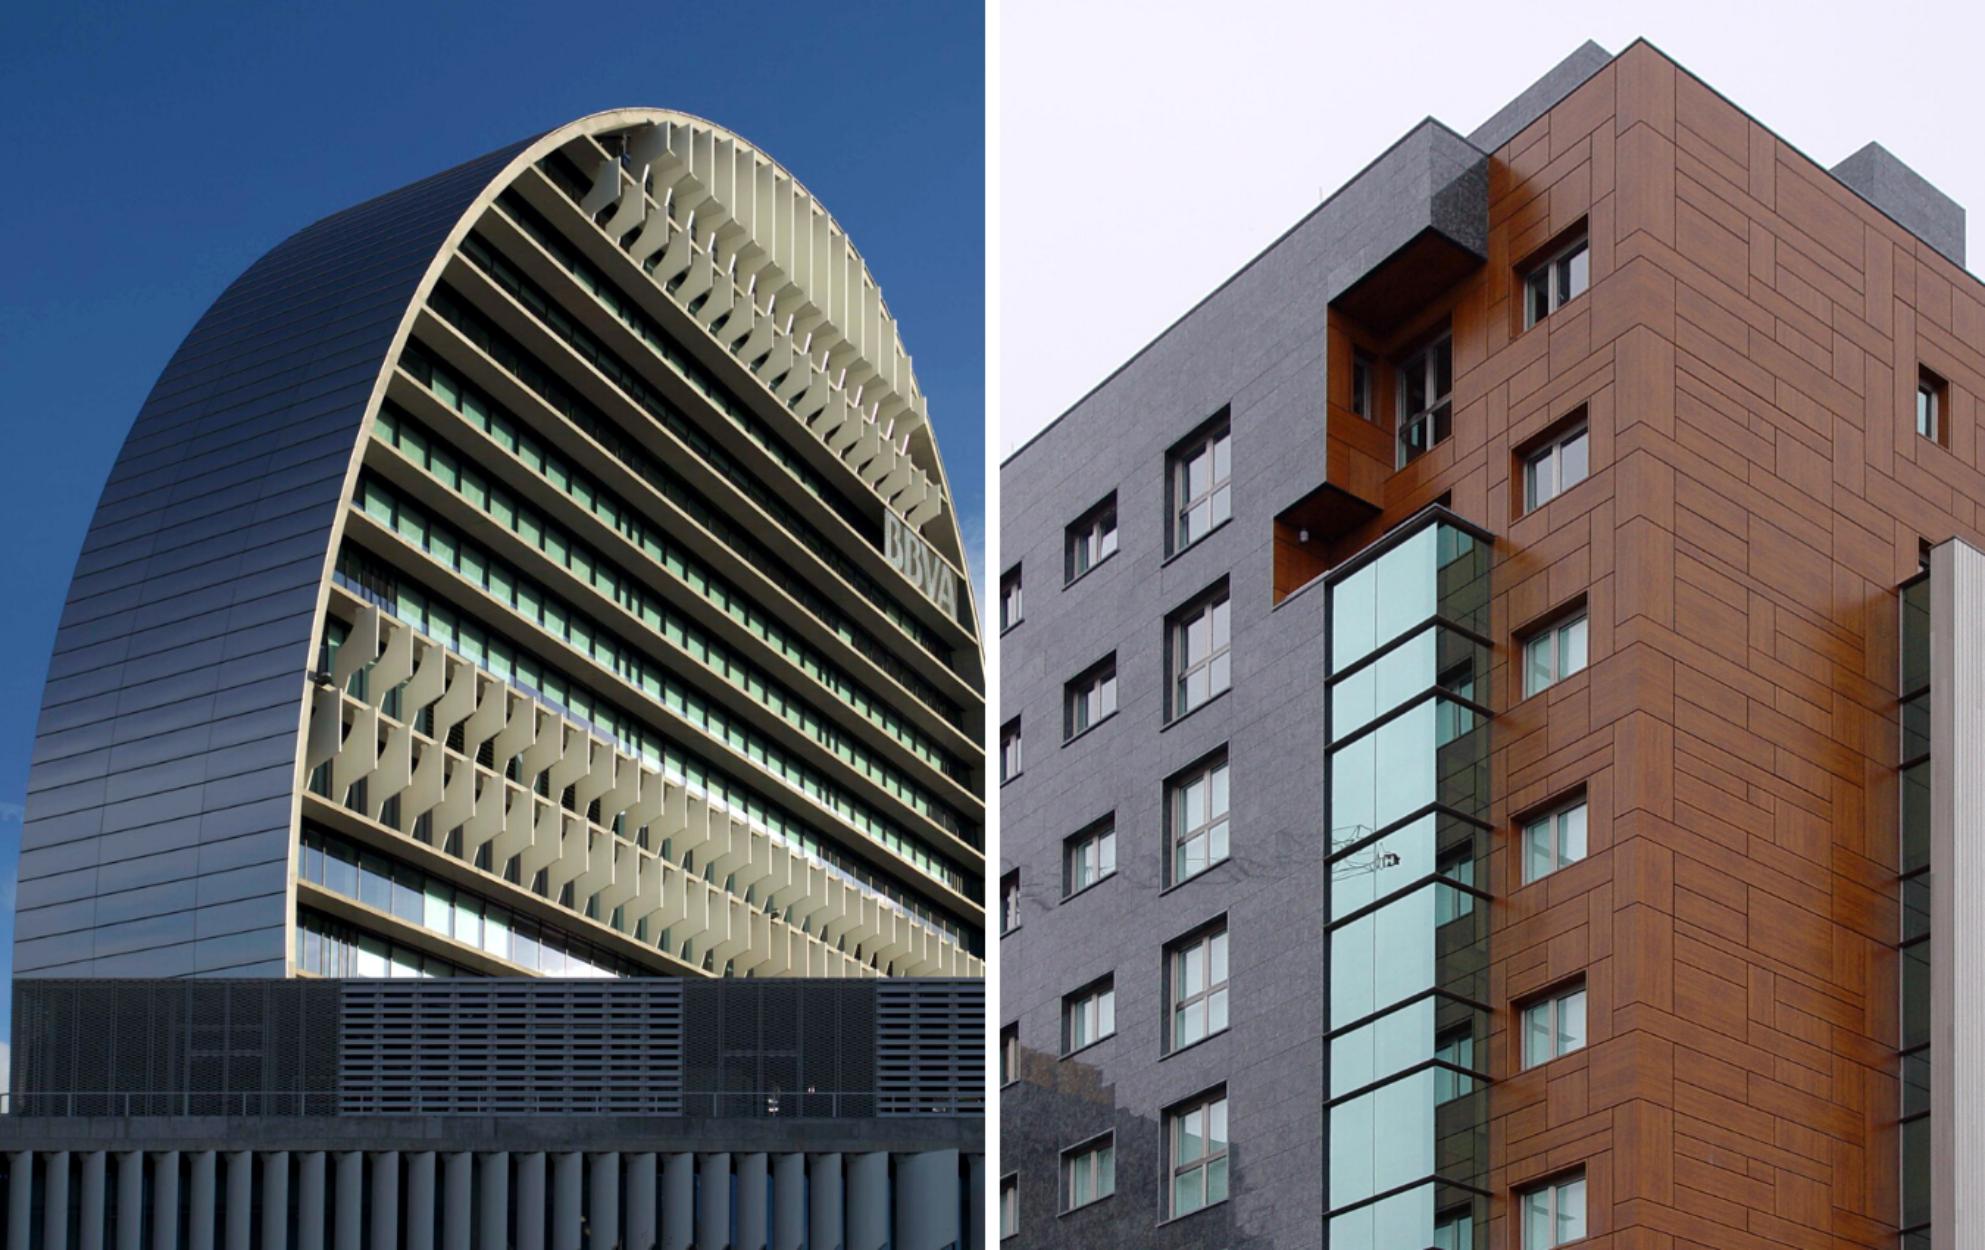 aluminium-honingraat-honeycomb-architect-facade-aldocore-allpro-building-construction-facade-design